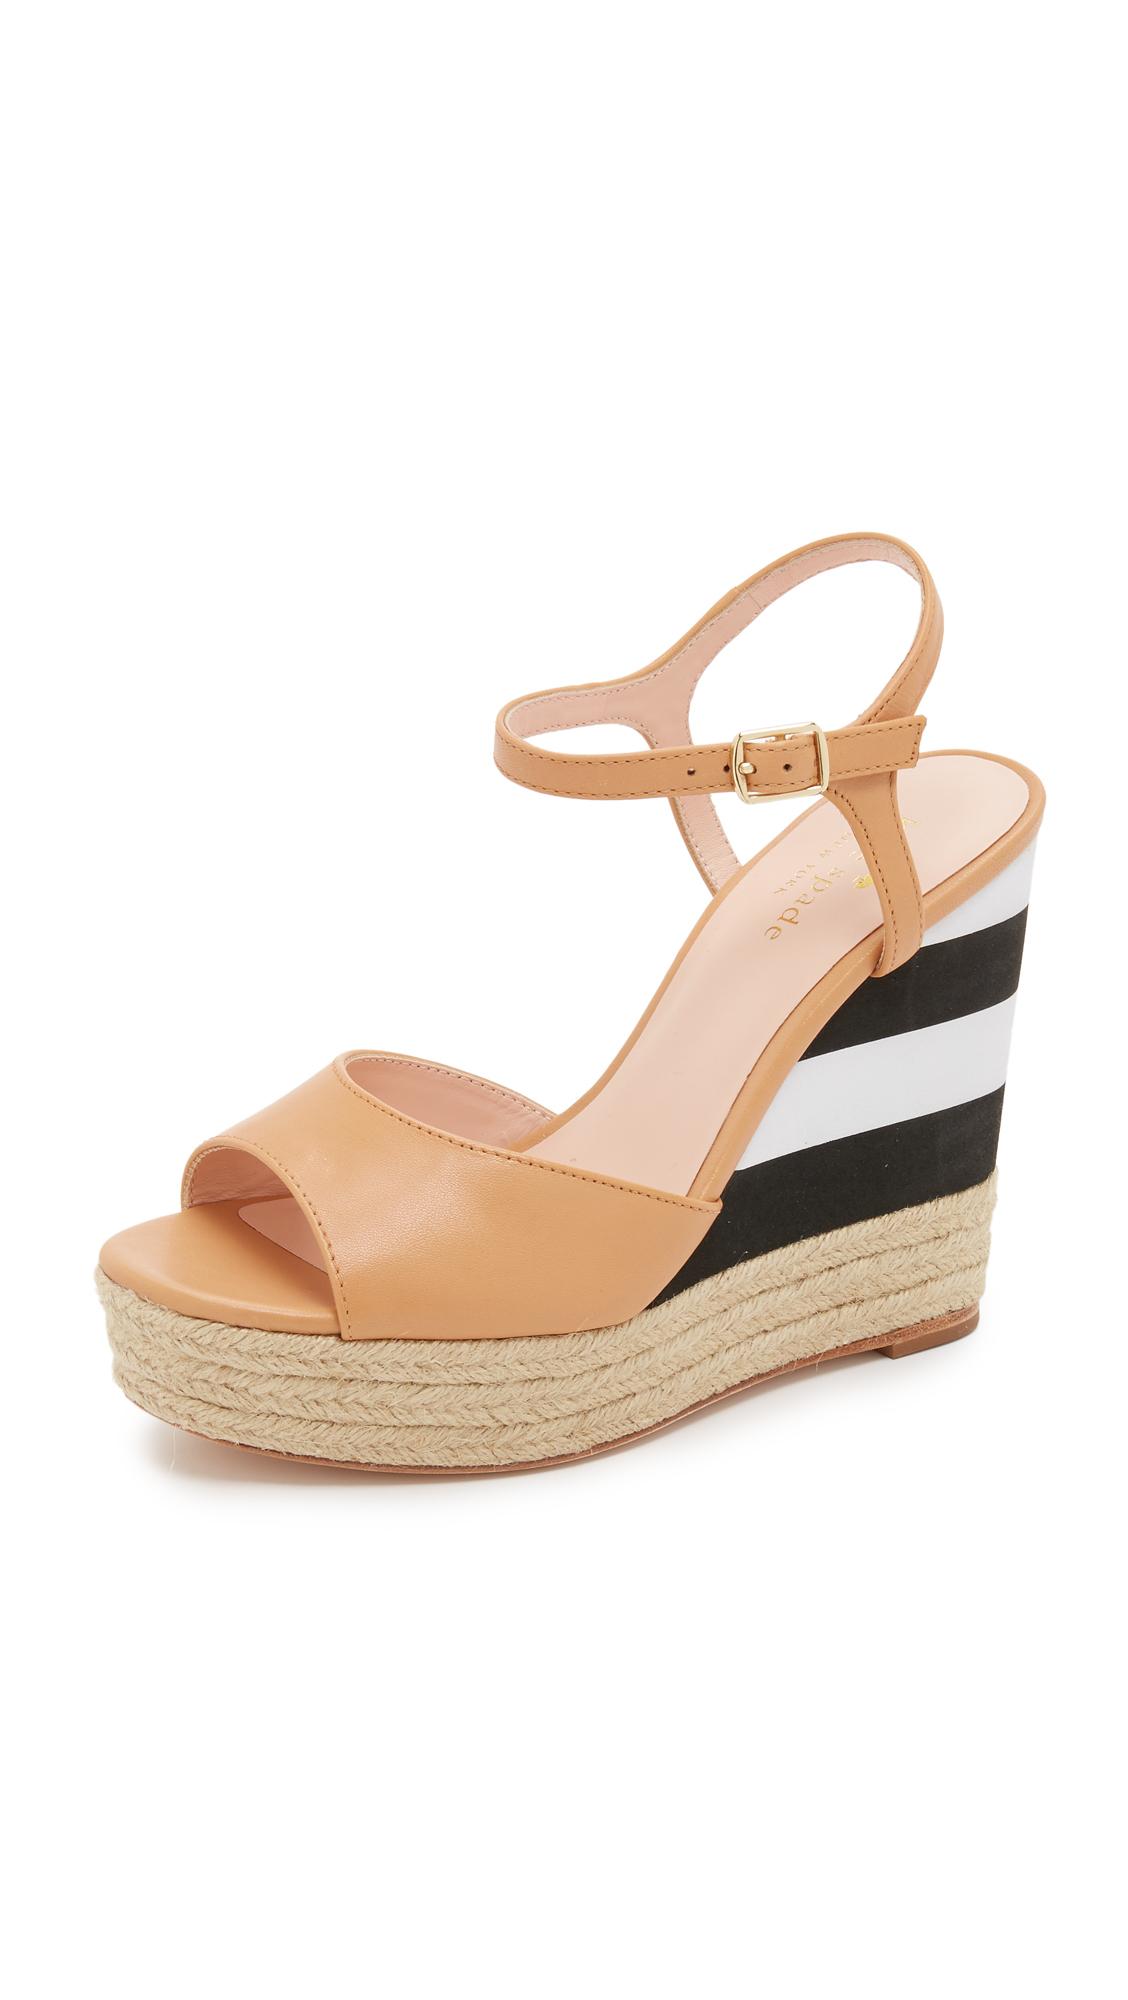 cheap sale finishline Kate Spade New York Cage Platform Sandals cheap sale purchase best seller cheap online cheap sale wiki buy cheap eastbay FdGF5xG5u